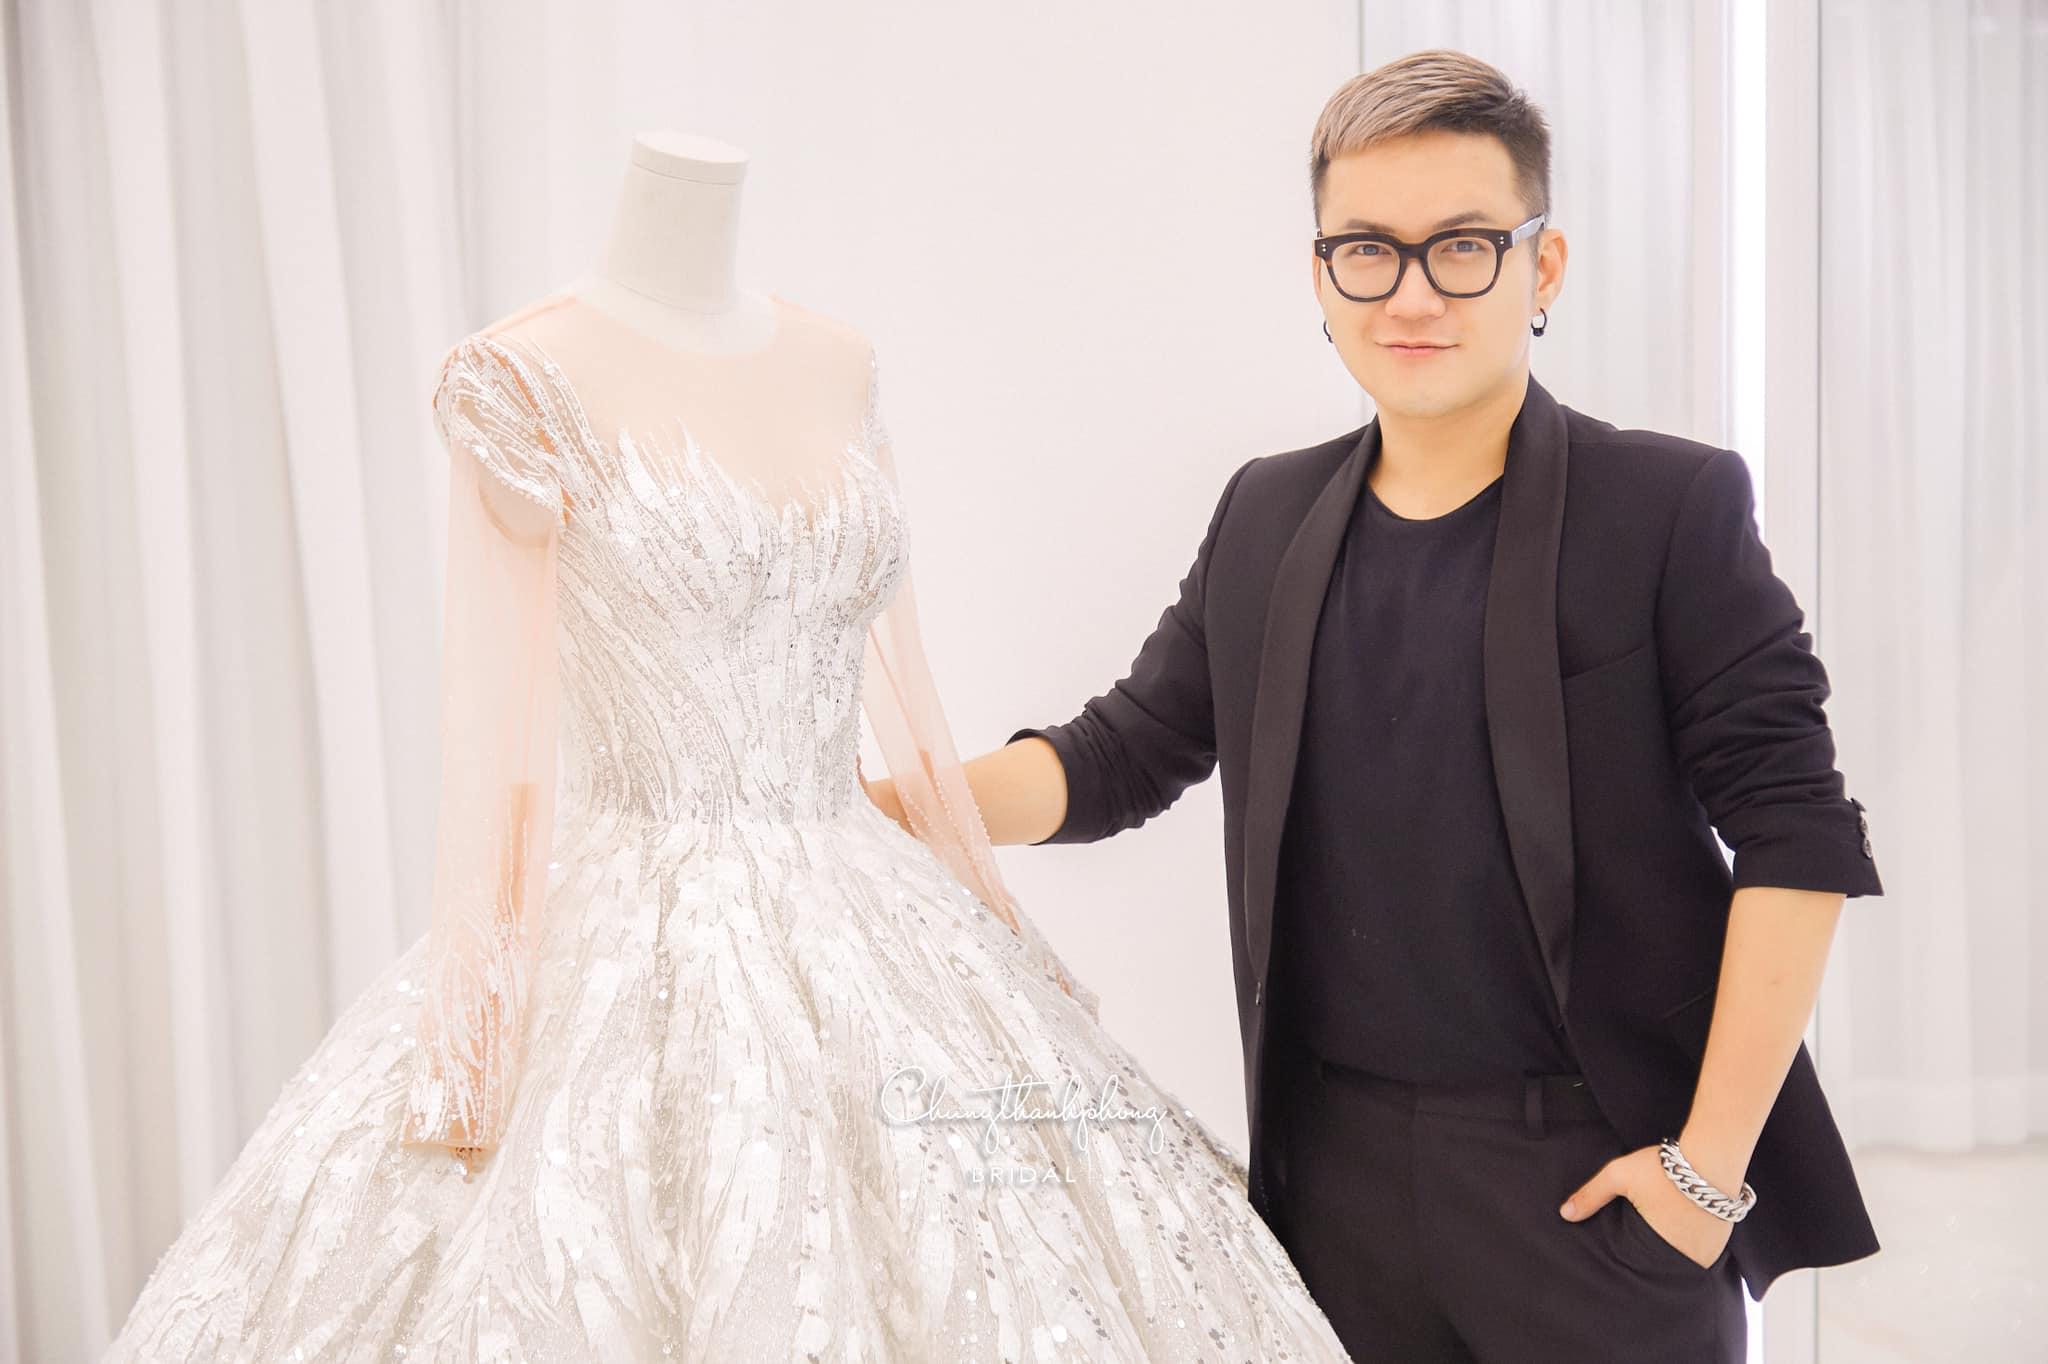 ntk ao cuoi_chung thanh phong profile